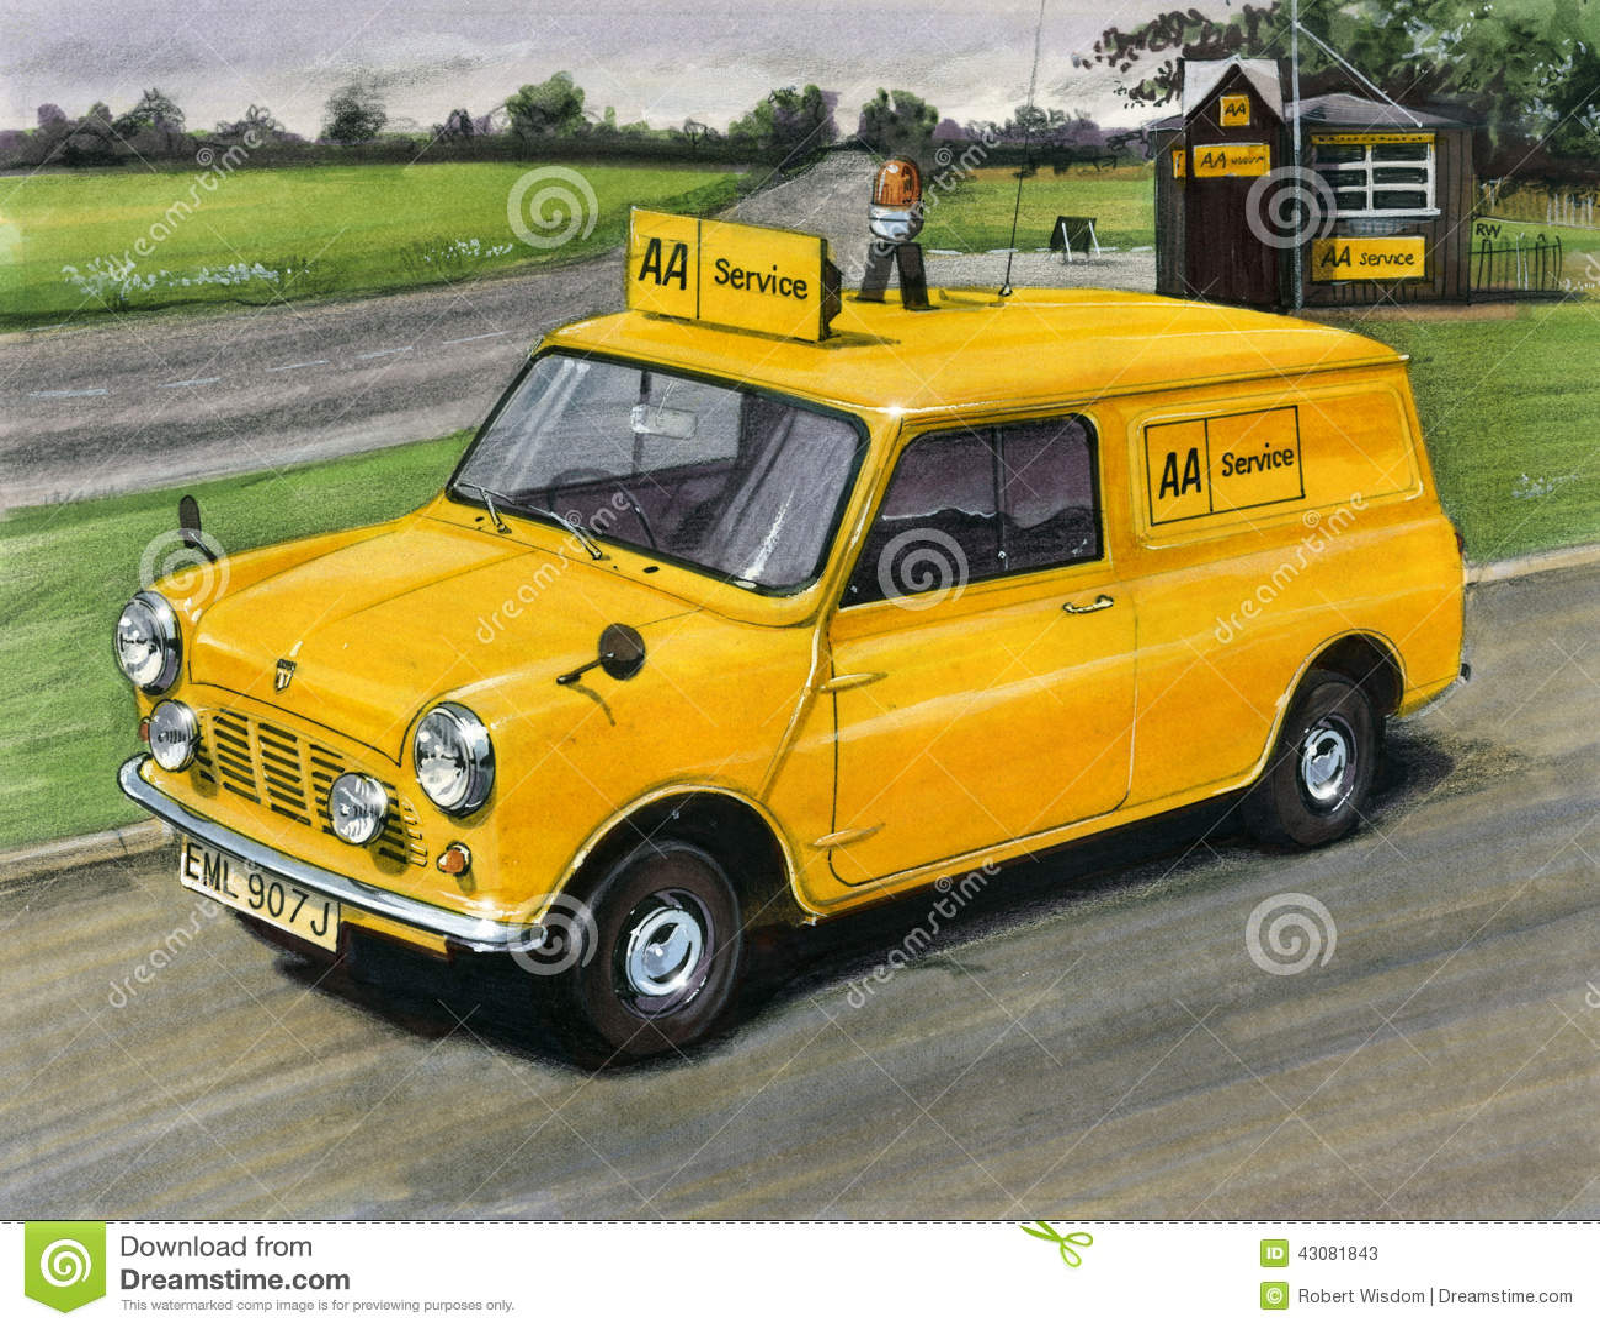 mini minivan automobile association aa editorial stock photo image 43081843. Black Bedroom Furniture Sets. Home Design Ideas